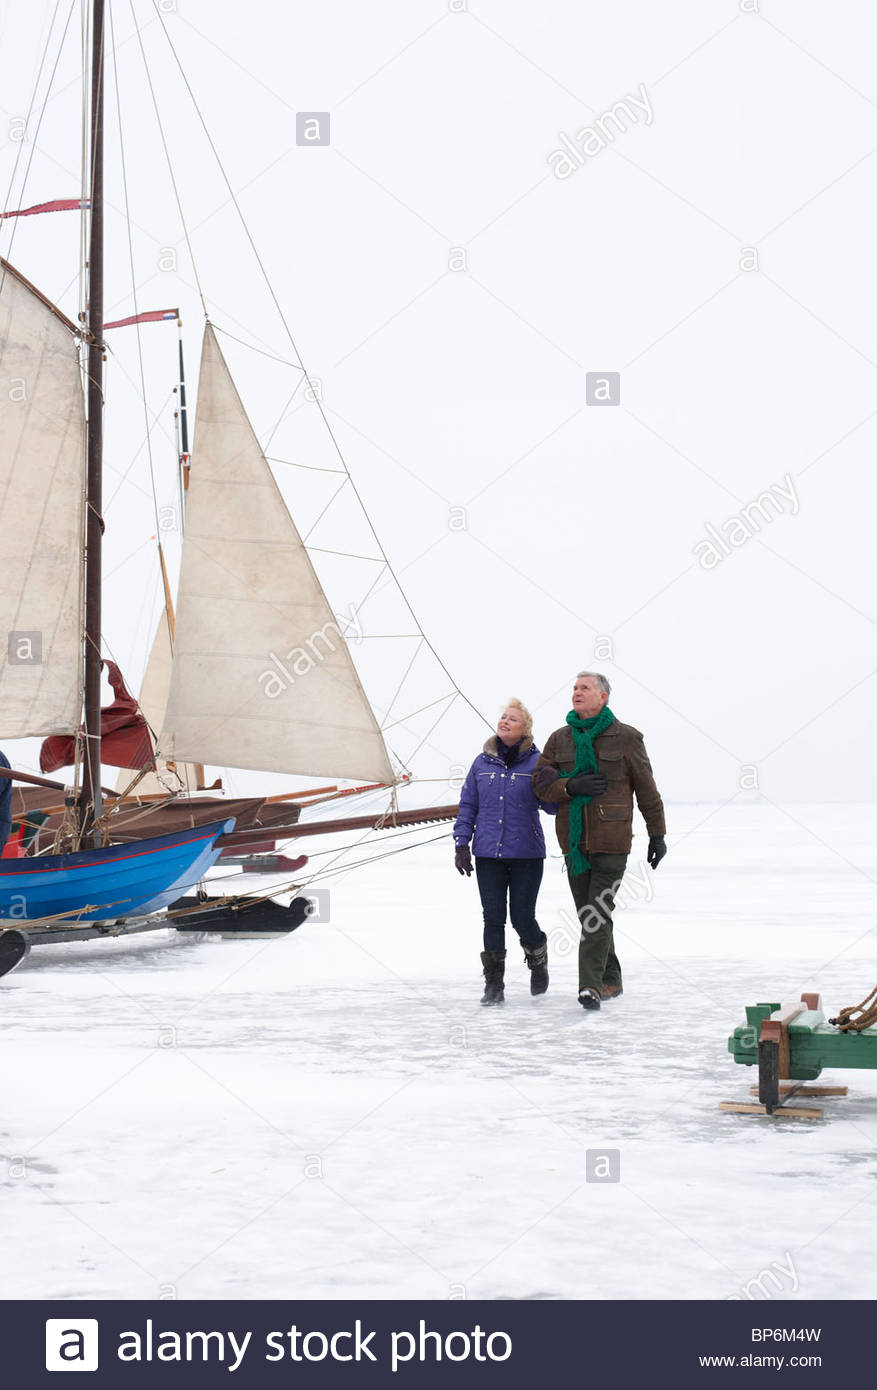 Senior couple walking on frozen lake near boats - Stock Image